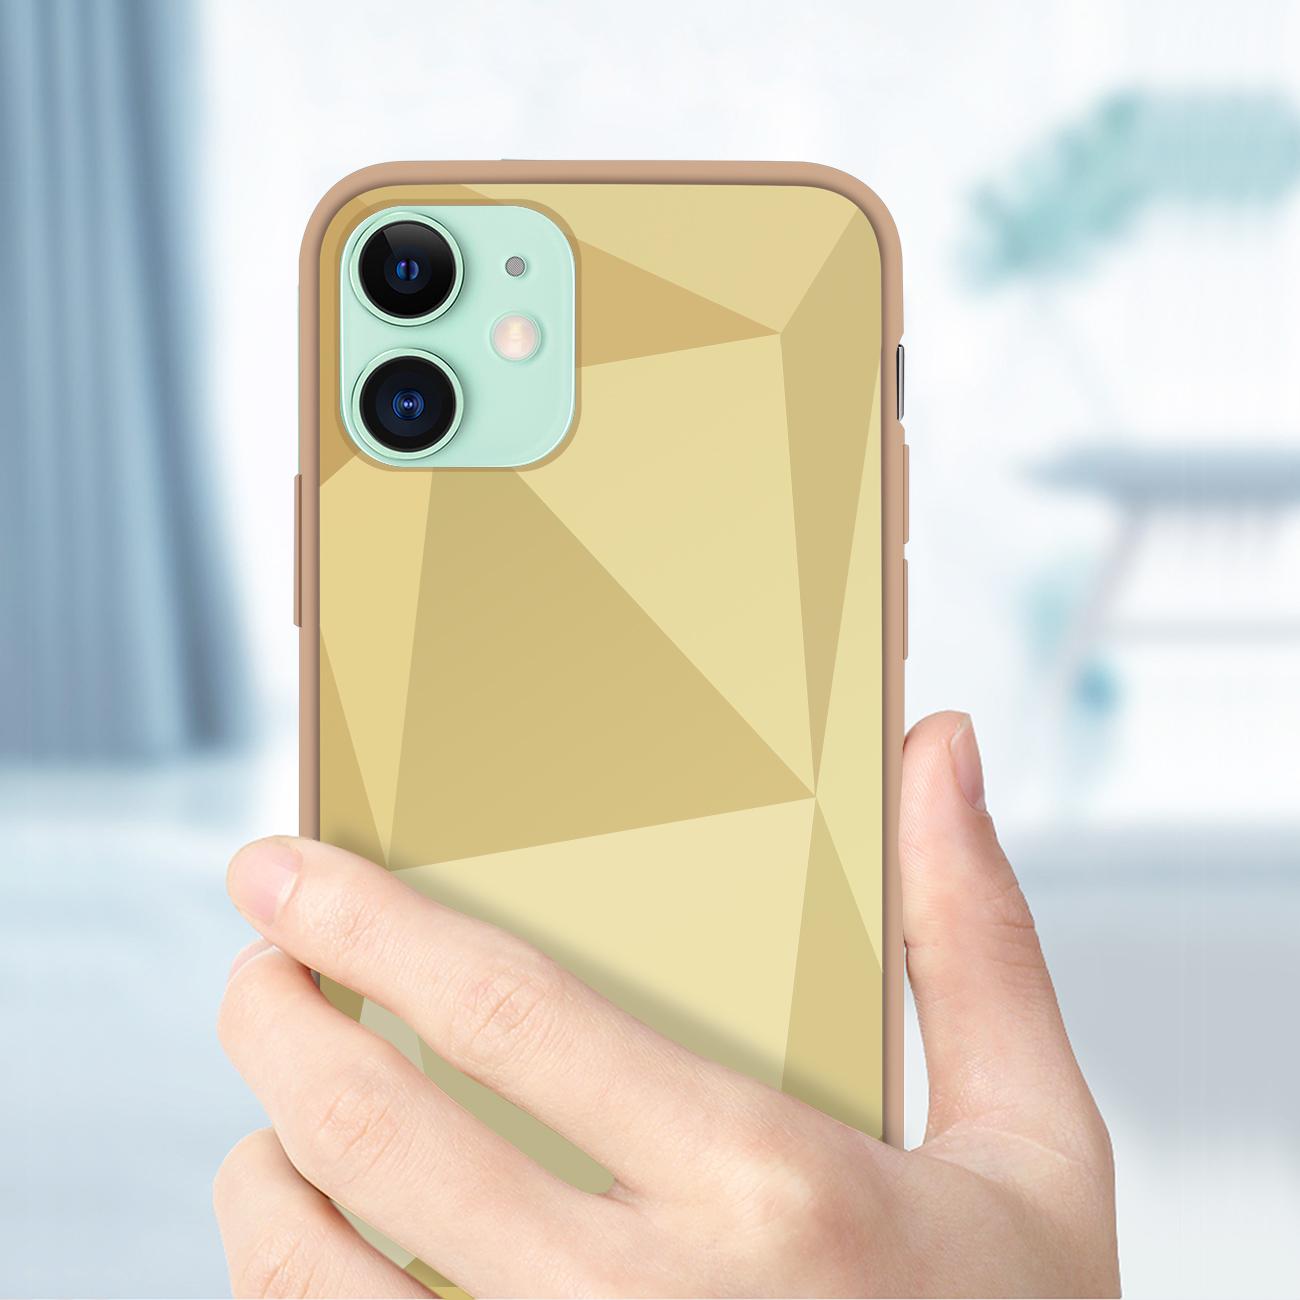 Apple iPhone 11 Apple Diamond Cases In Gold